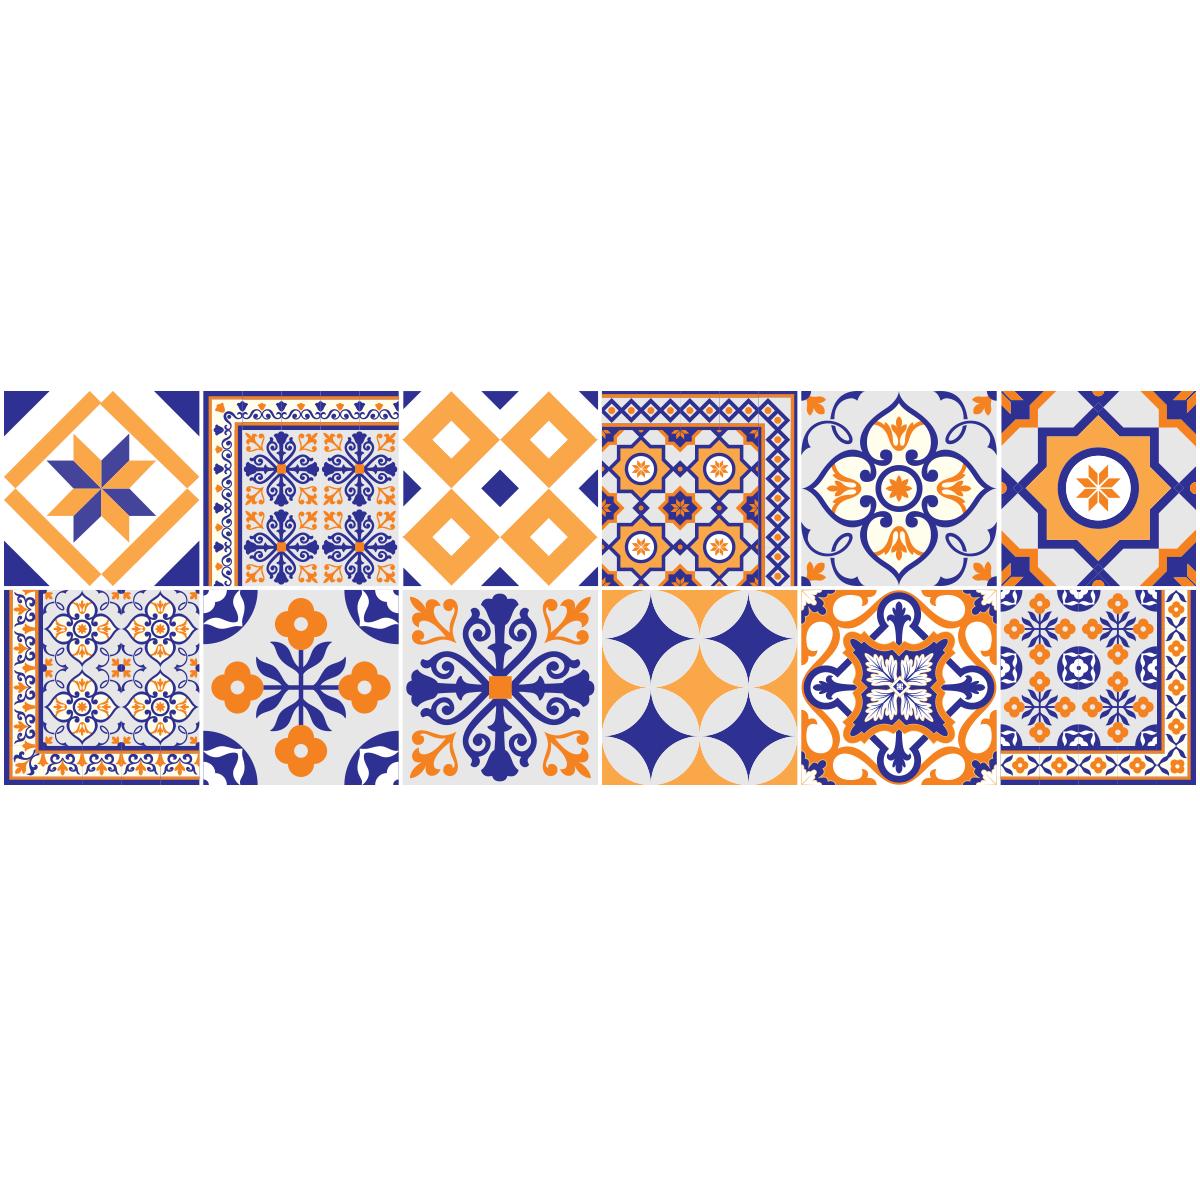 12 stickers carrelages vintage bleus et orange stickers art et design artistiques ambiance. Black Bedroom Furniture Sets. Home Design Ideas